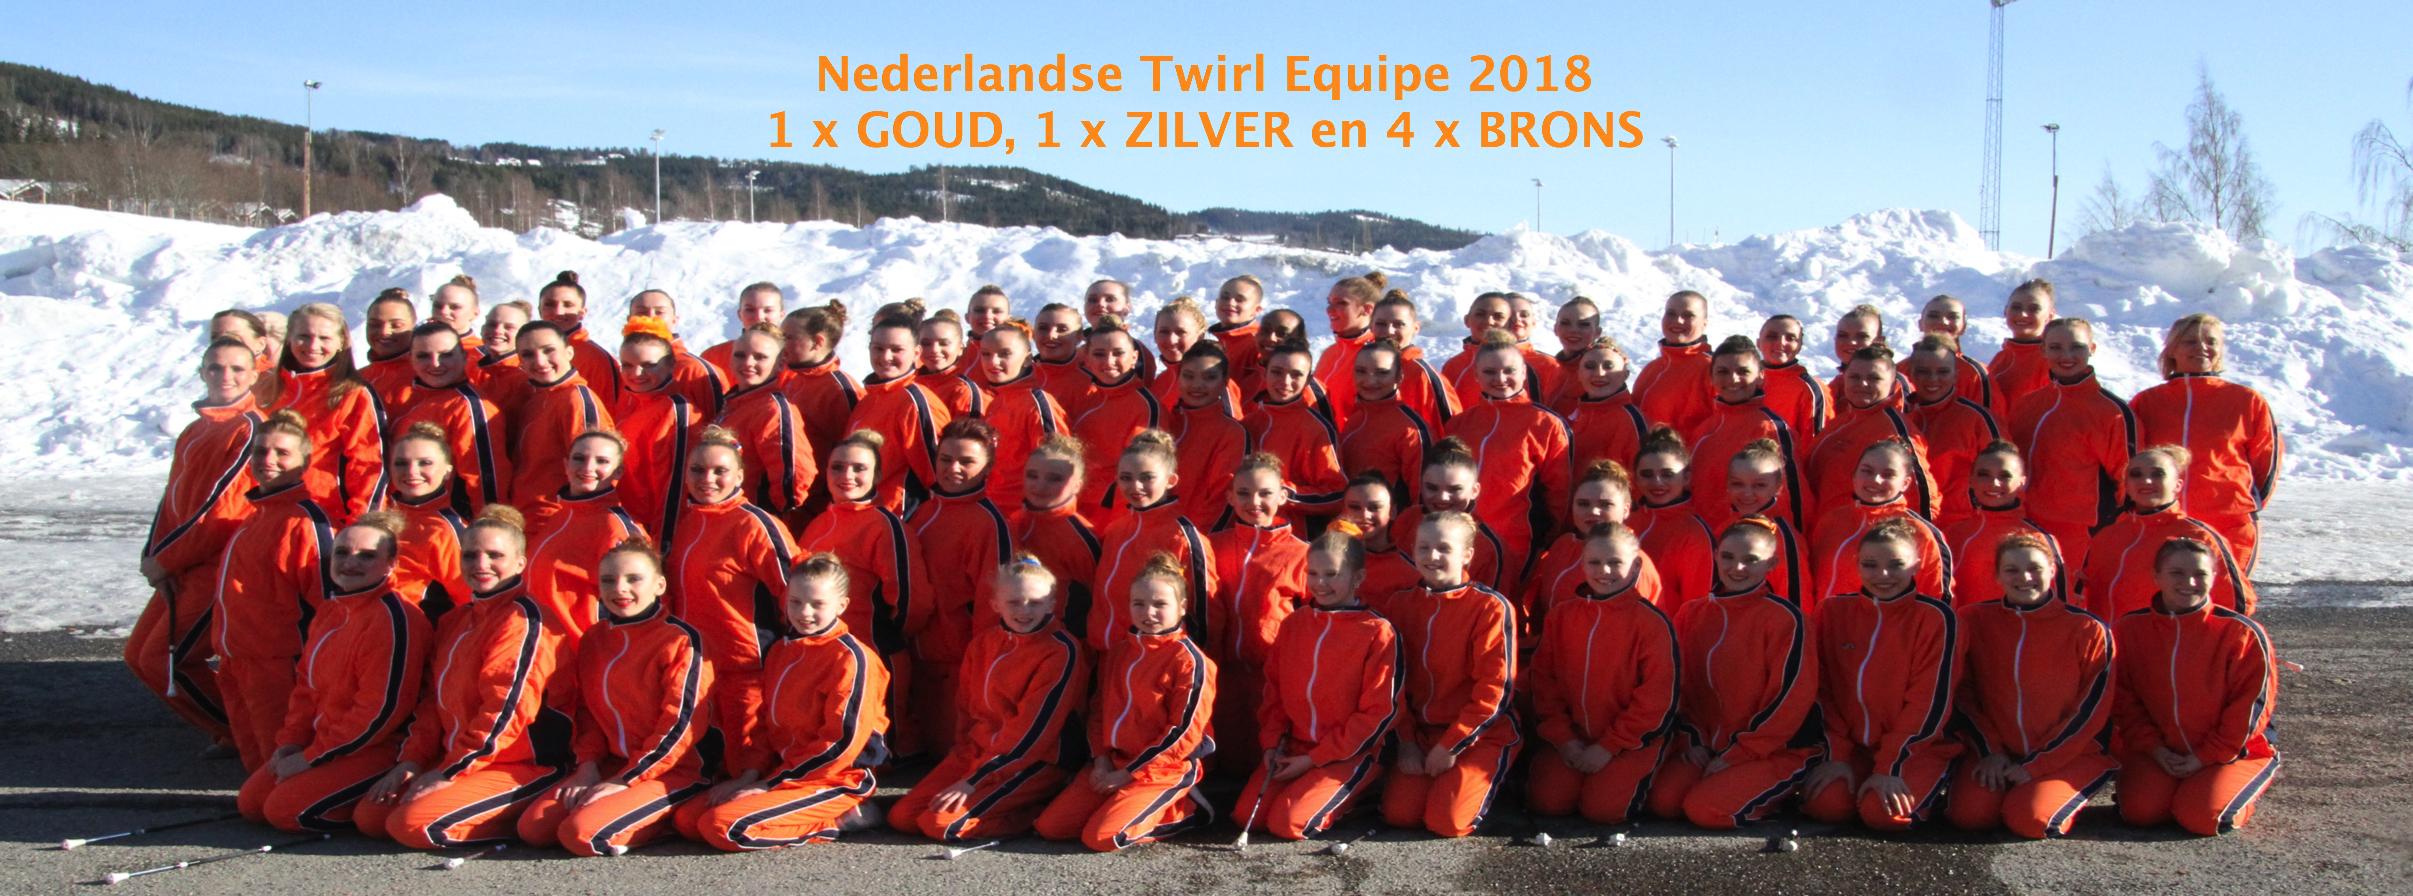 Twirl Equipe 2018